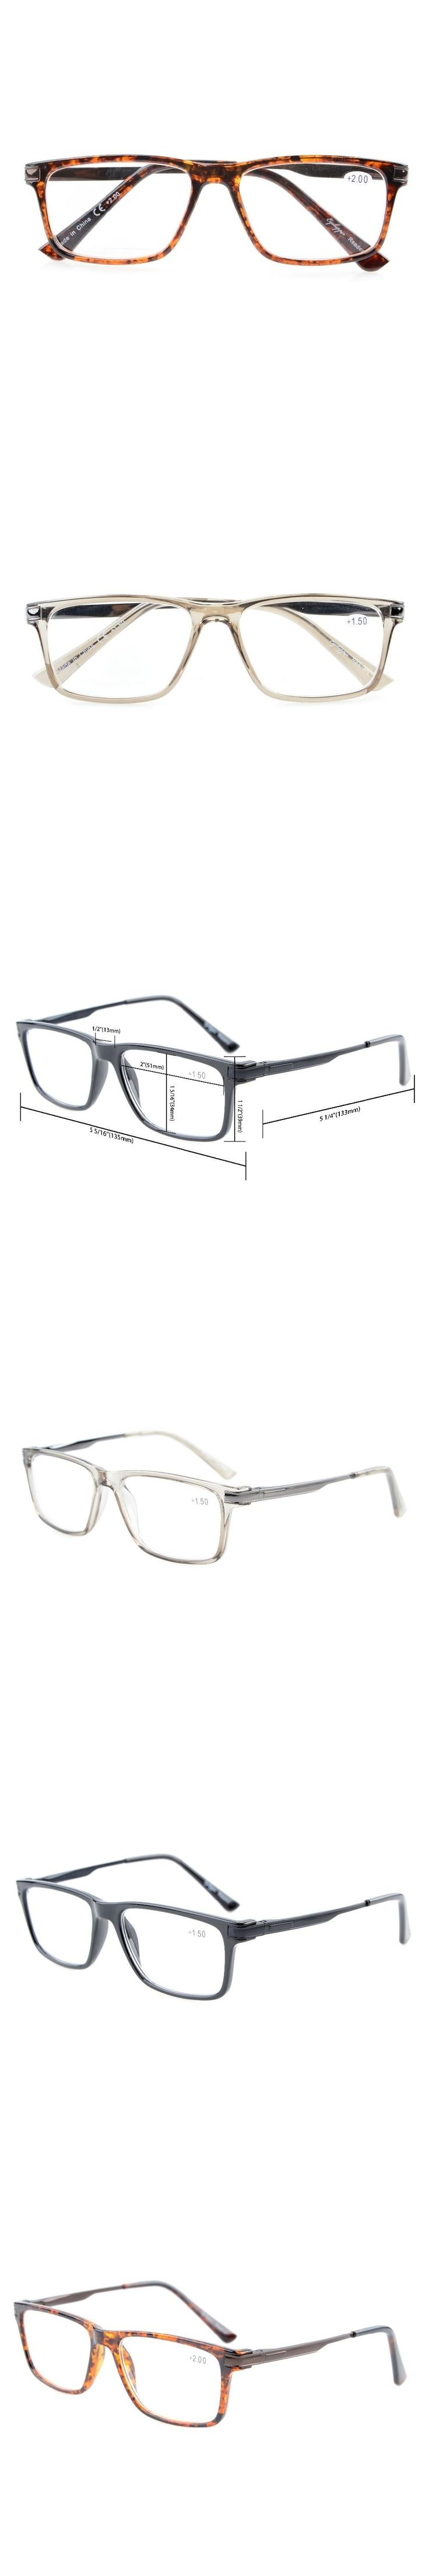 TR005 Eyekepper Quality TR90 Frame Spring Hinges Reading Glasses For Men Women Stylish Crystal Clear Vision +0.50----+3.00